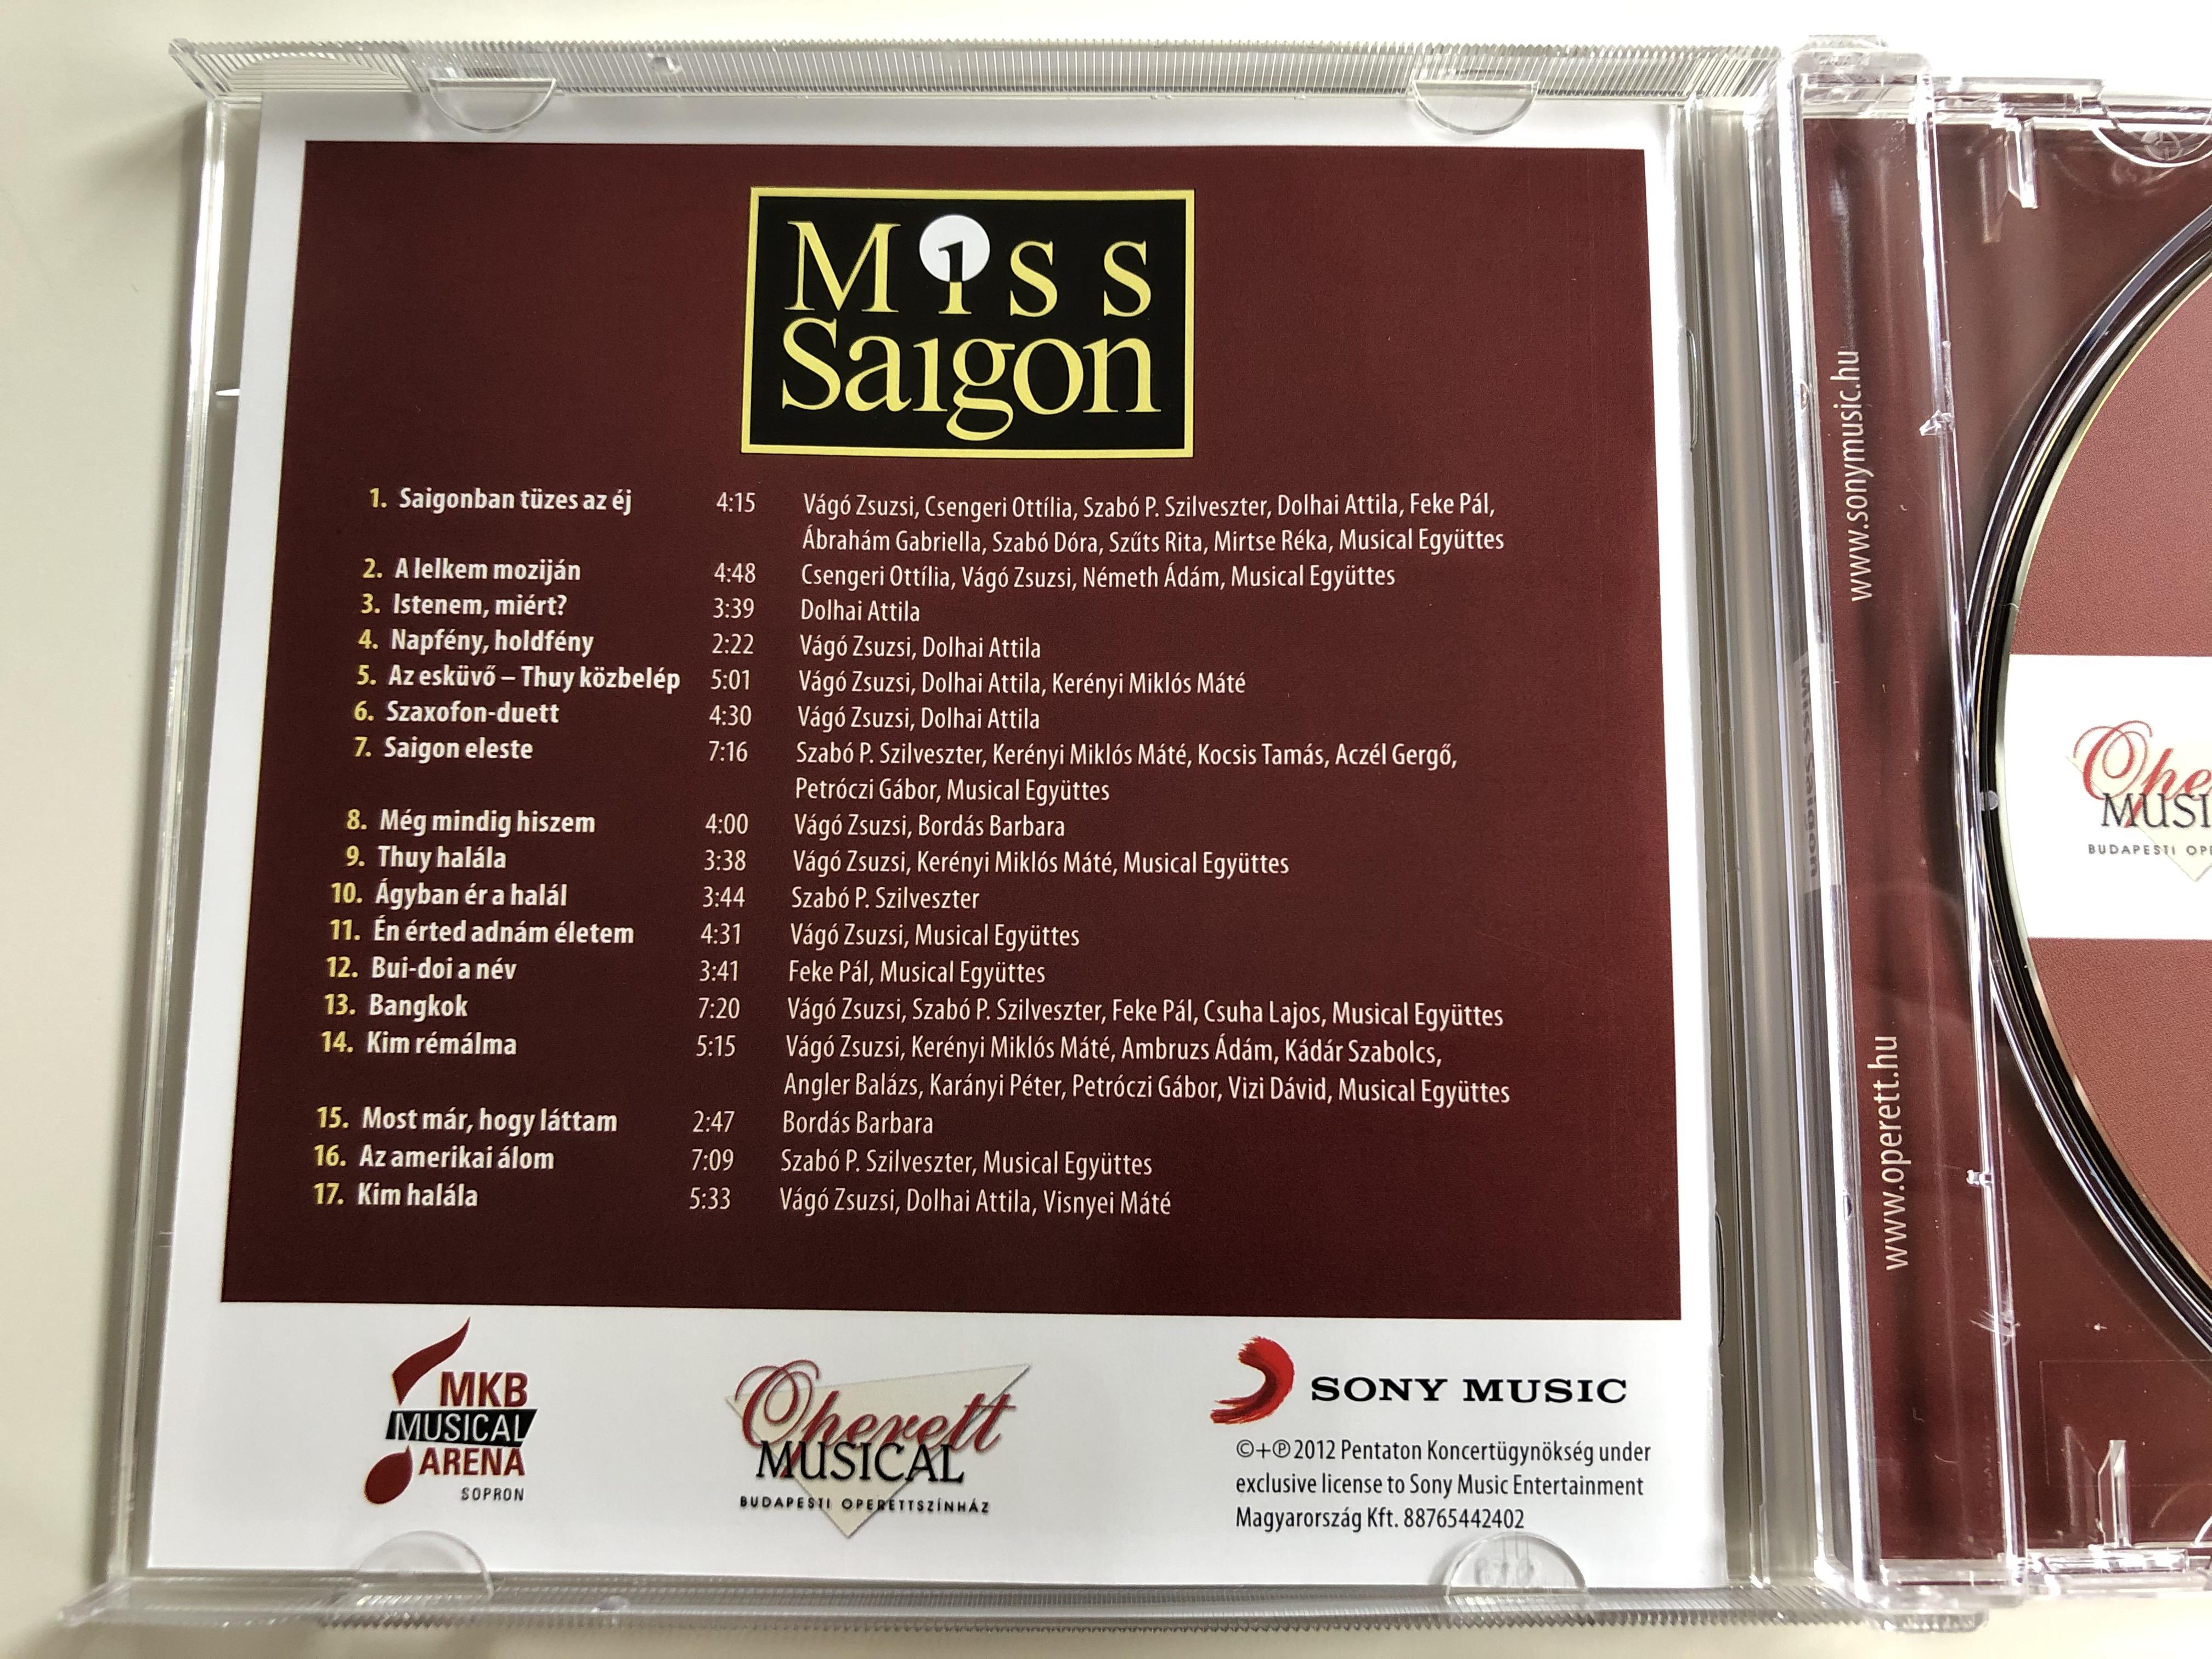 budapest-operettszinhaz-mkb-musical-arena-miss-saigon-musical-zene-claude-michael-schonberg-dalszoveg-richard-maltby-jr.-es-alain-boubil-sony-music-entertainment-audio-cd-2012-887654424020-6-.jpg